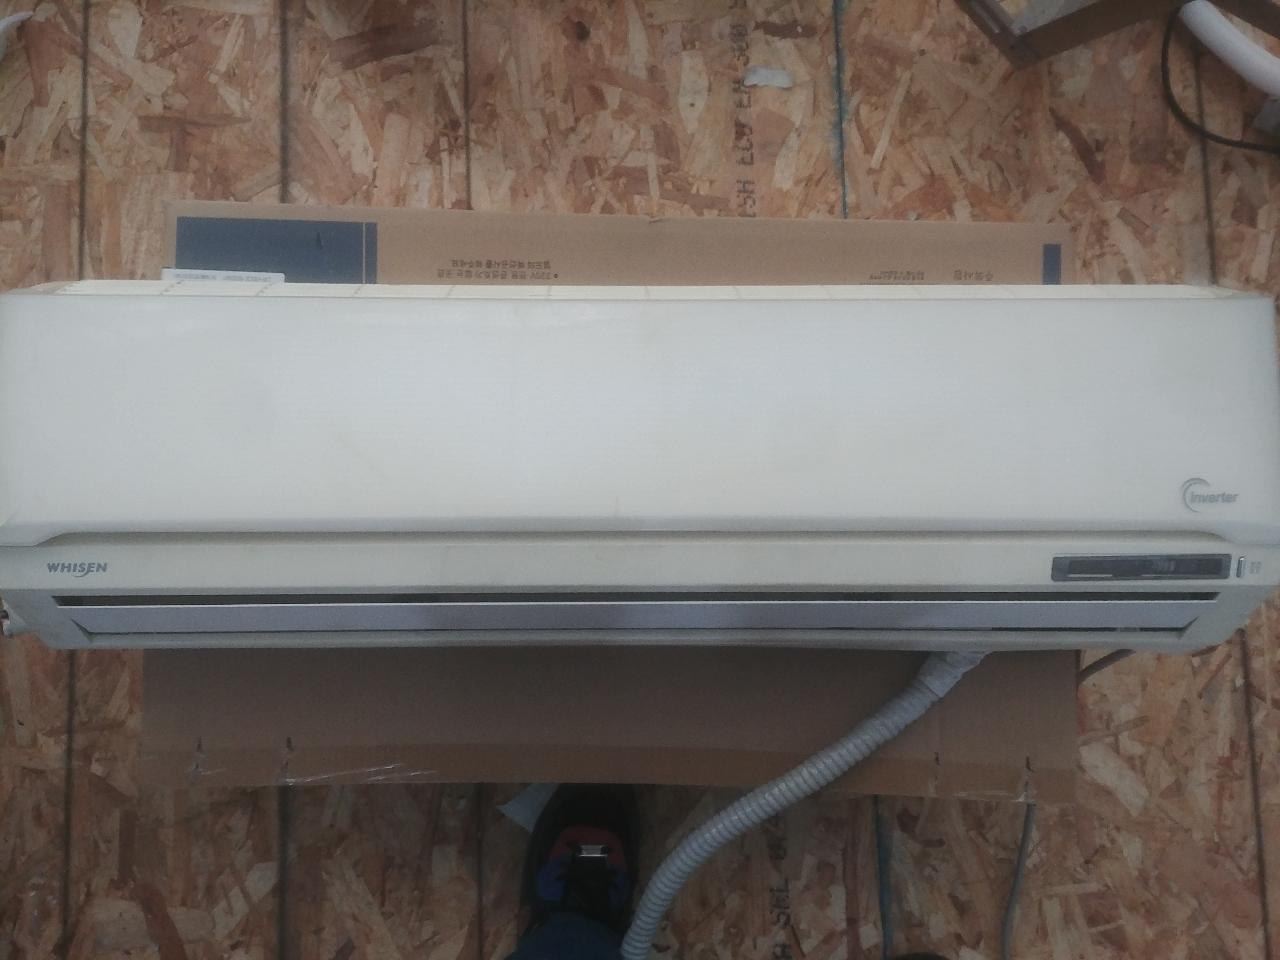 LG 9평 인버터 벽걸이 냉난방기 판매요